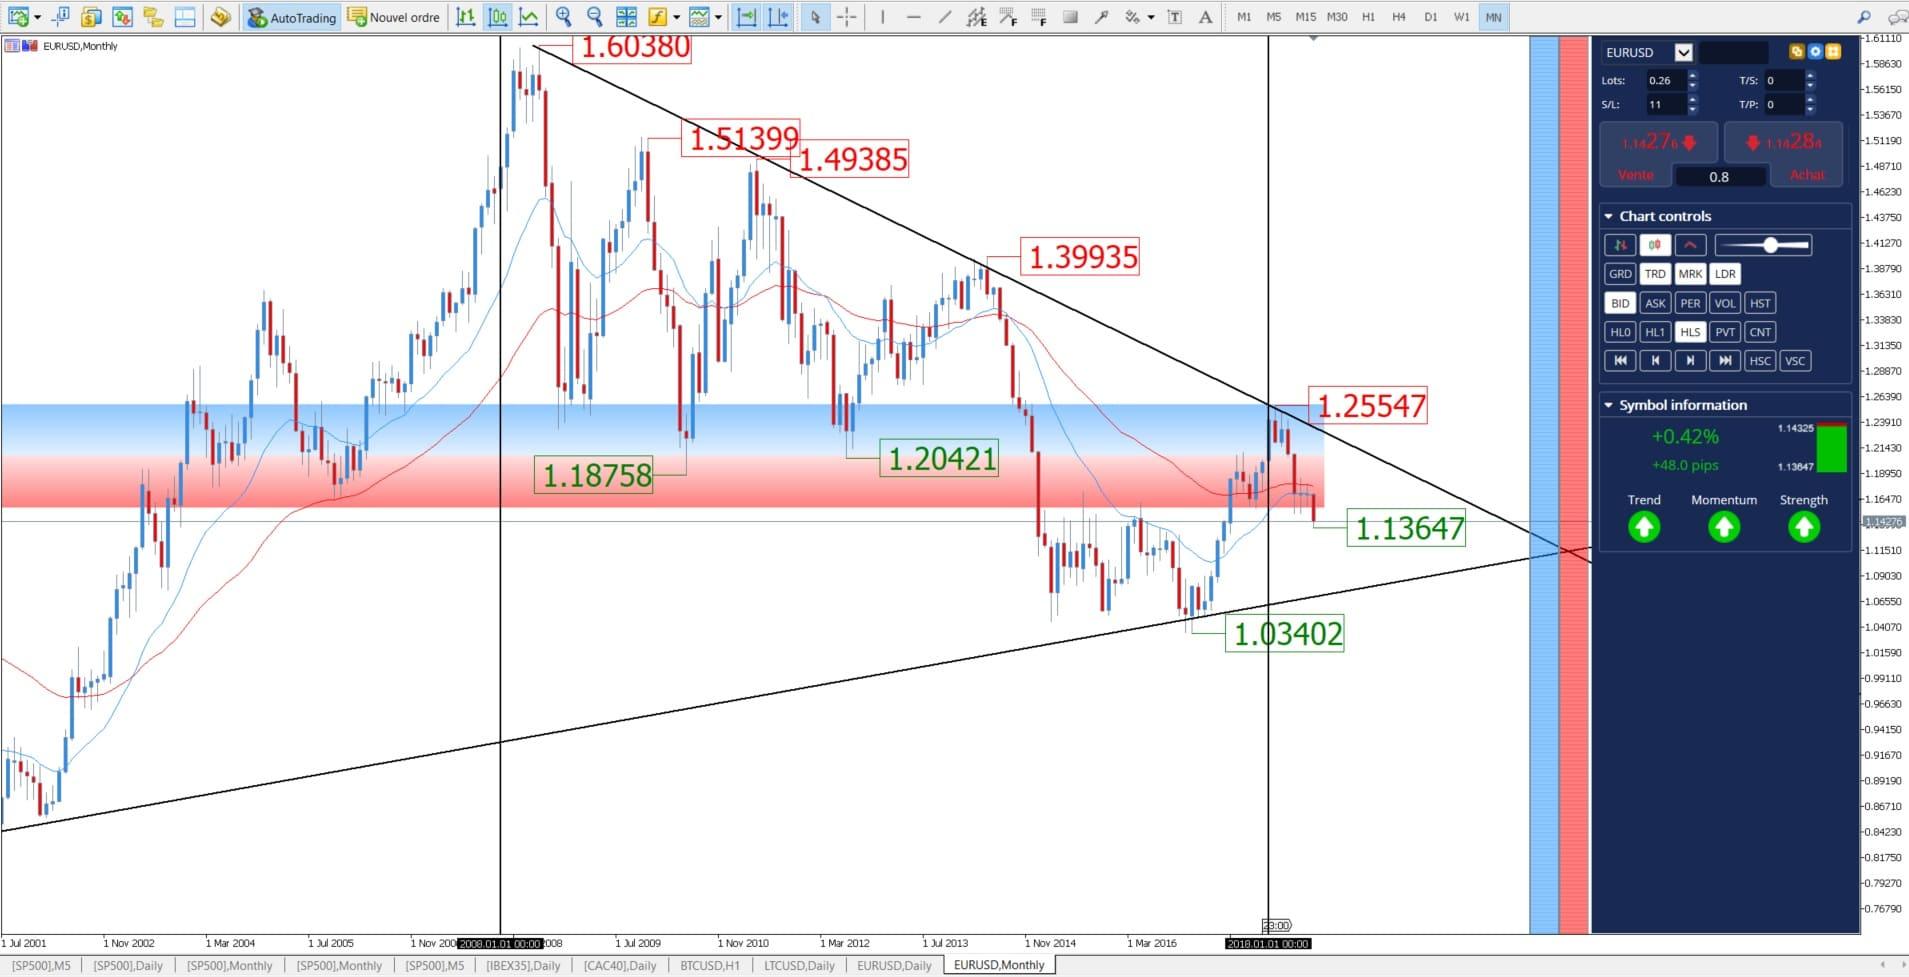 eur usd chart - trading euro dollar